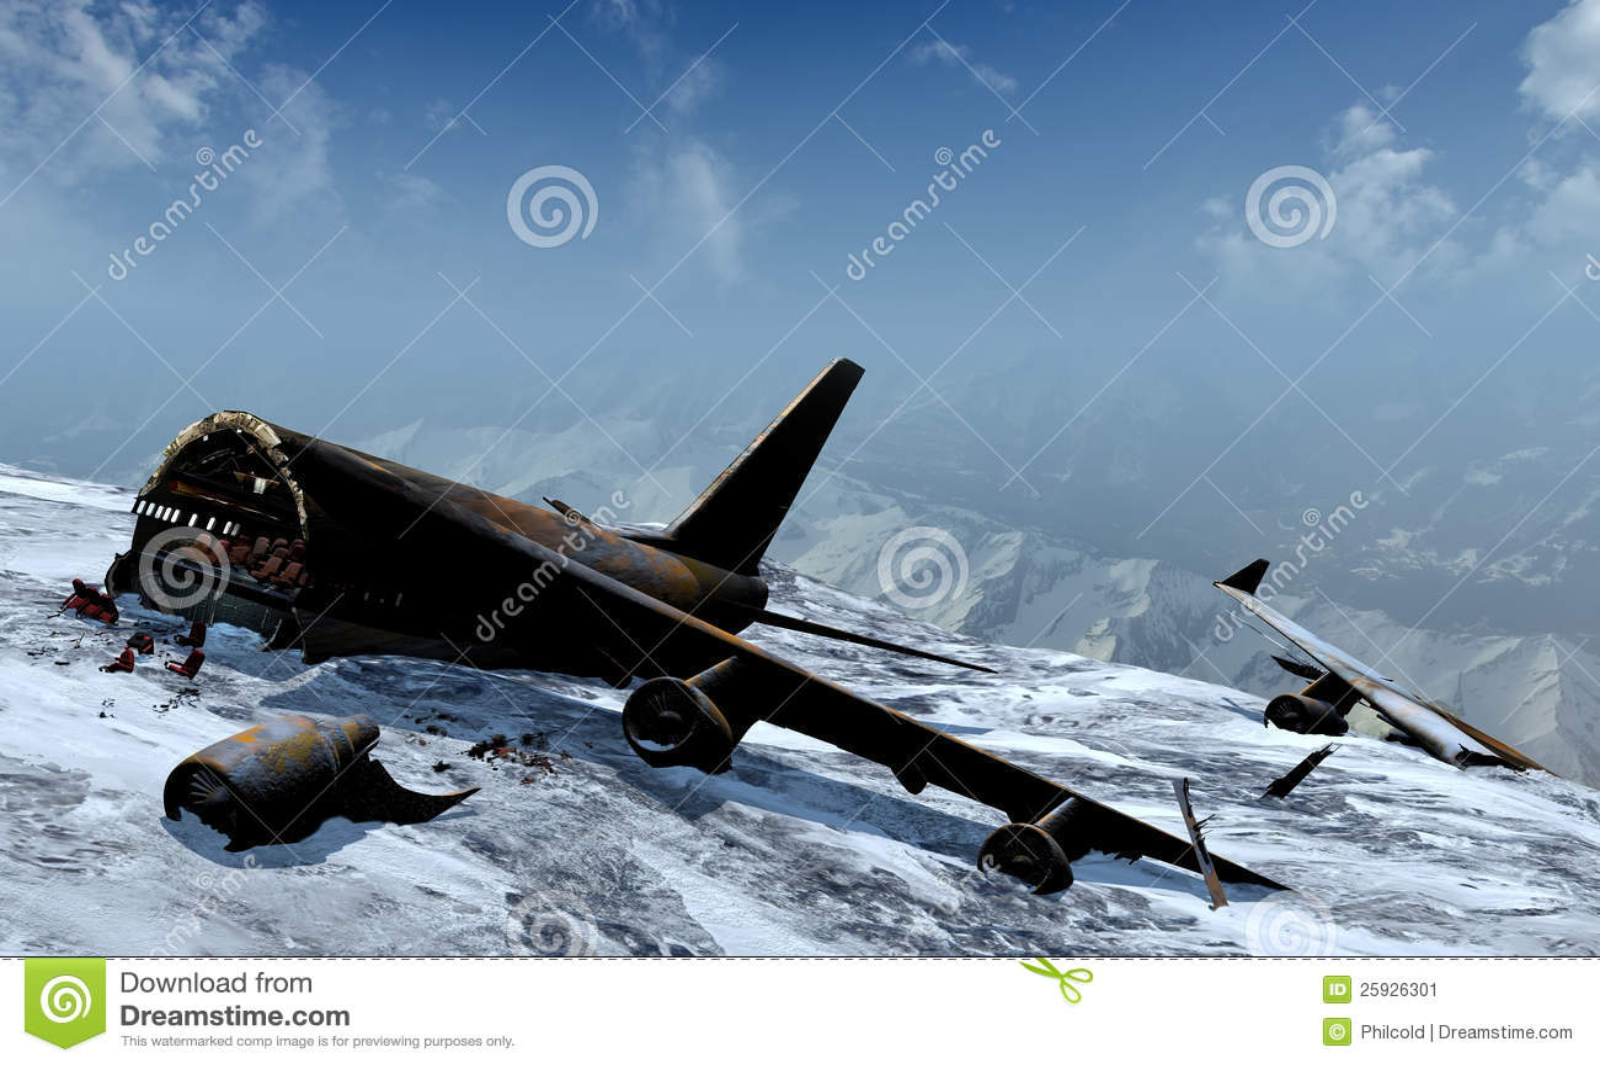 Mountain Plane Crash Stock Image - Image: 25926301